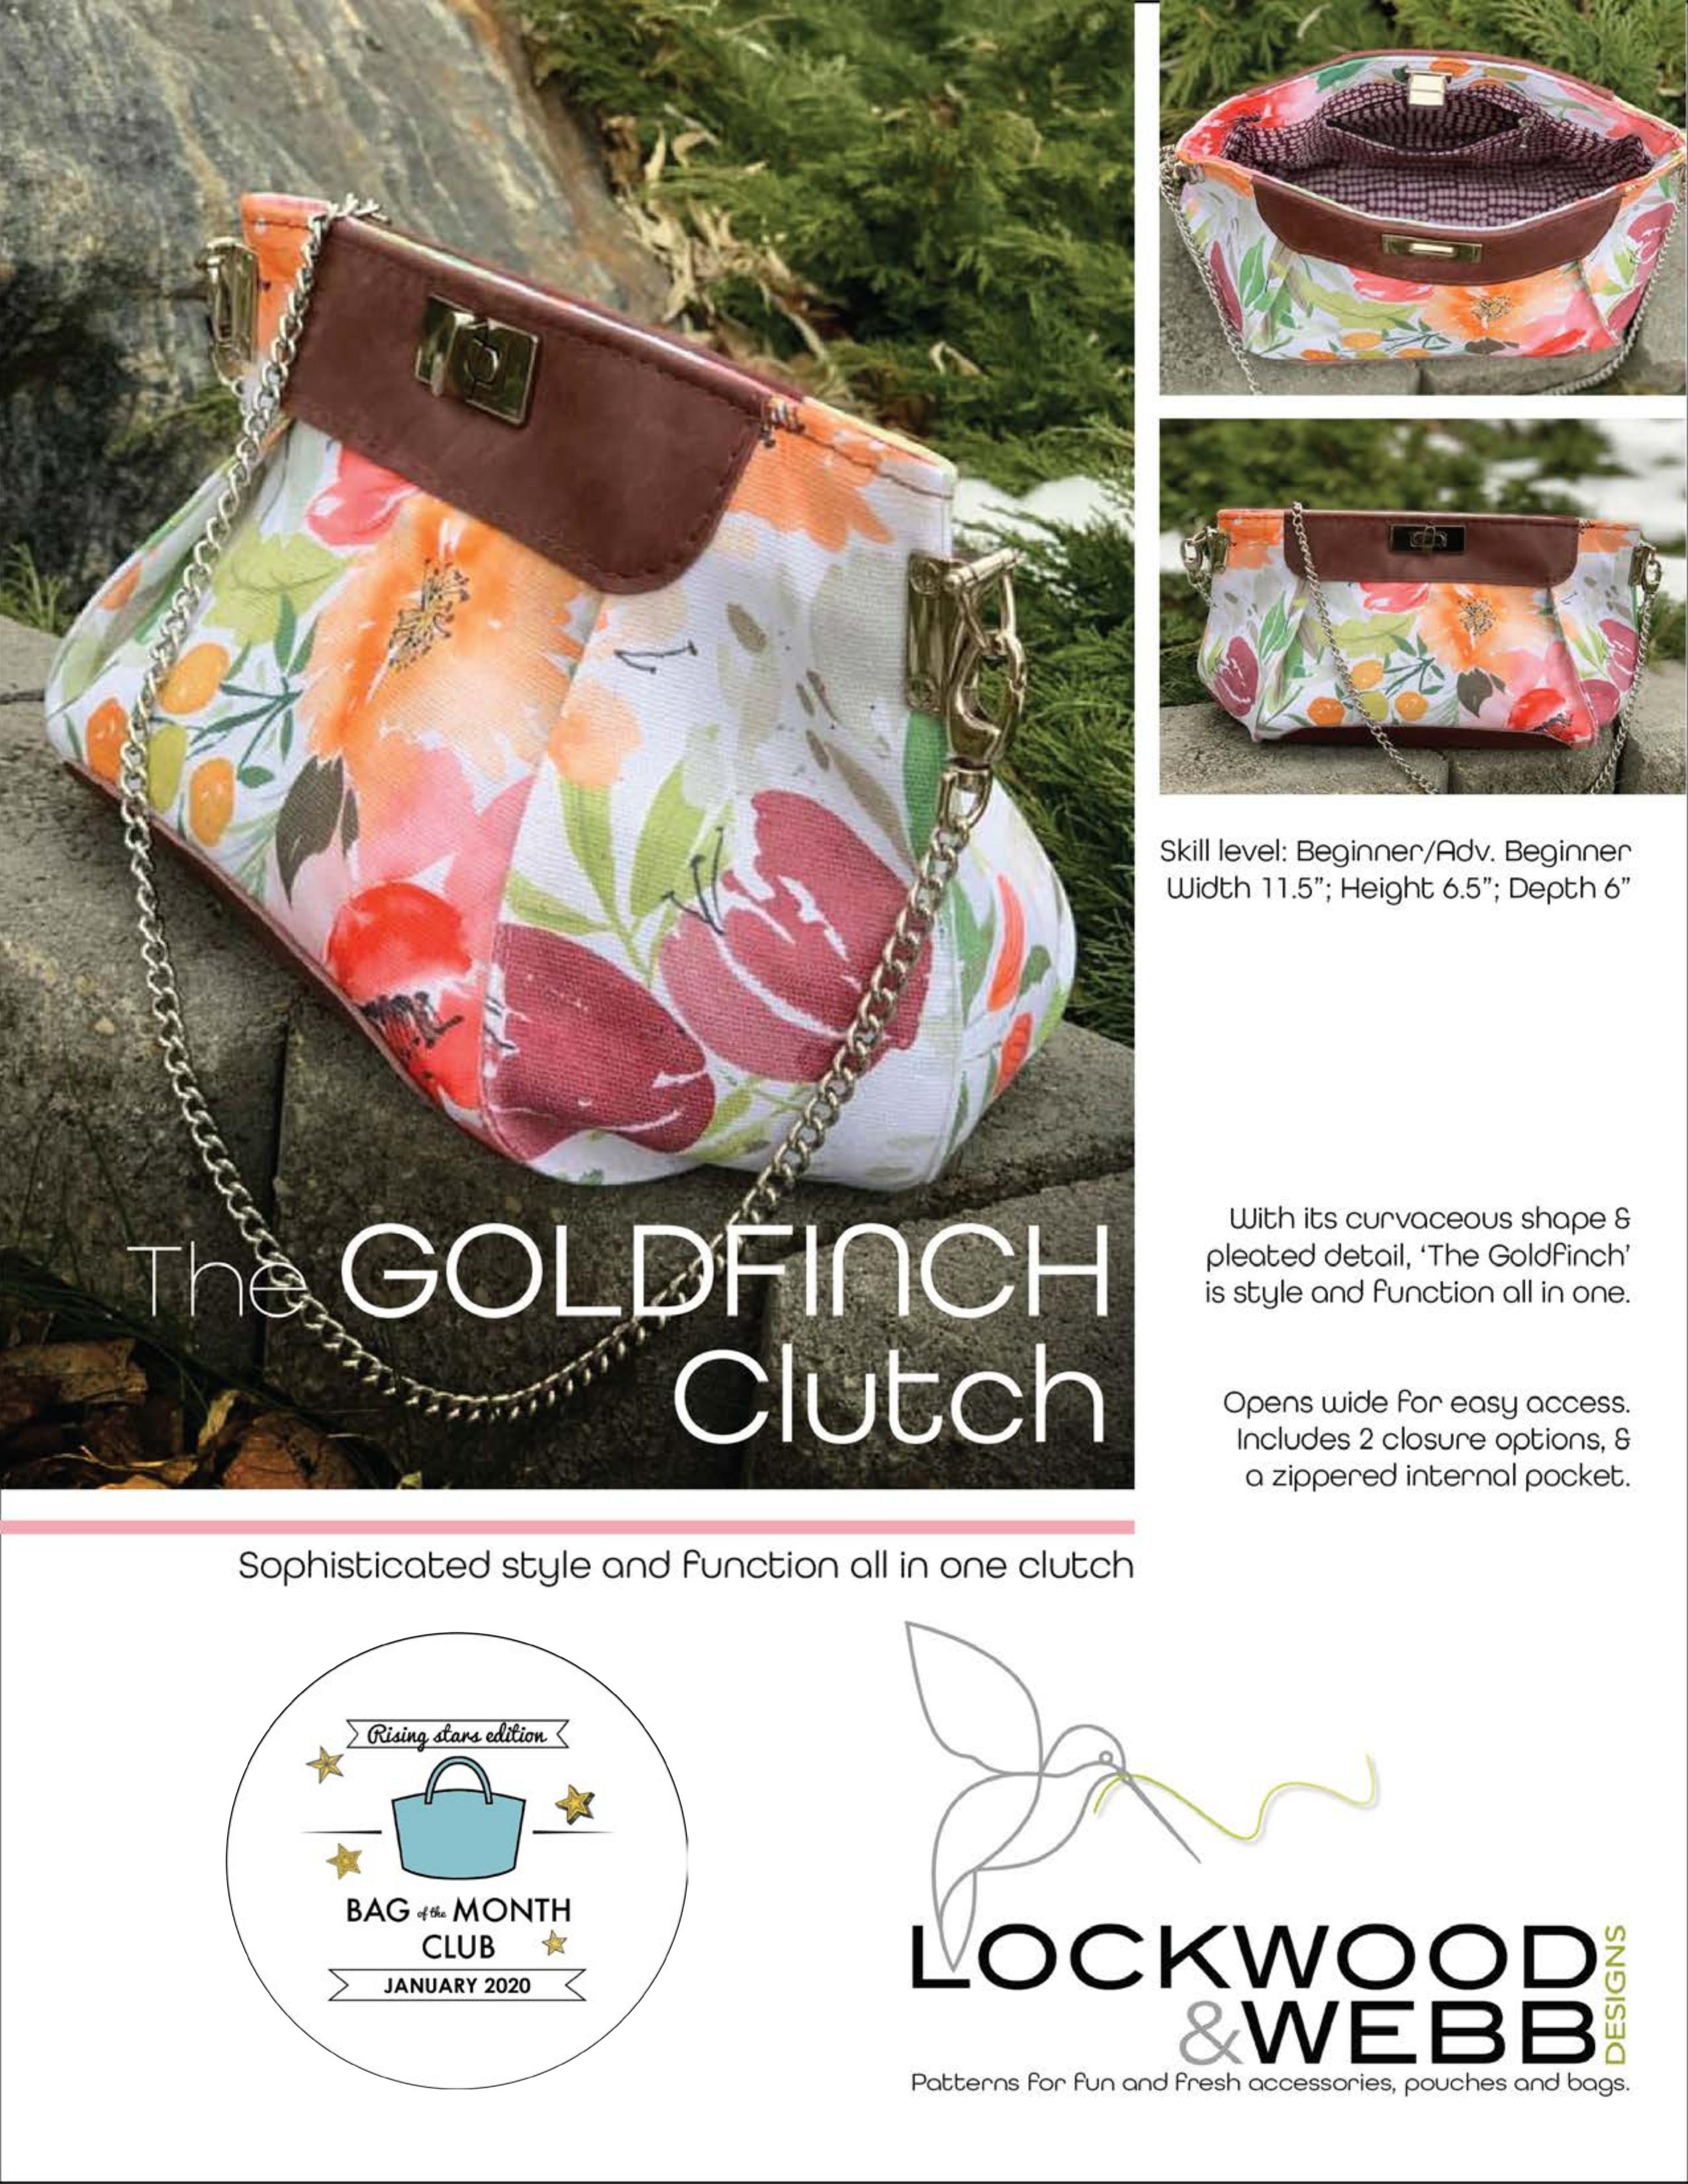 The Goldfinch Clutch by Lockwood & Webb